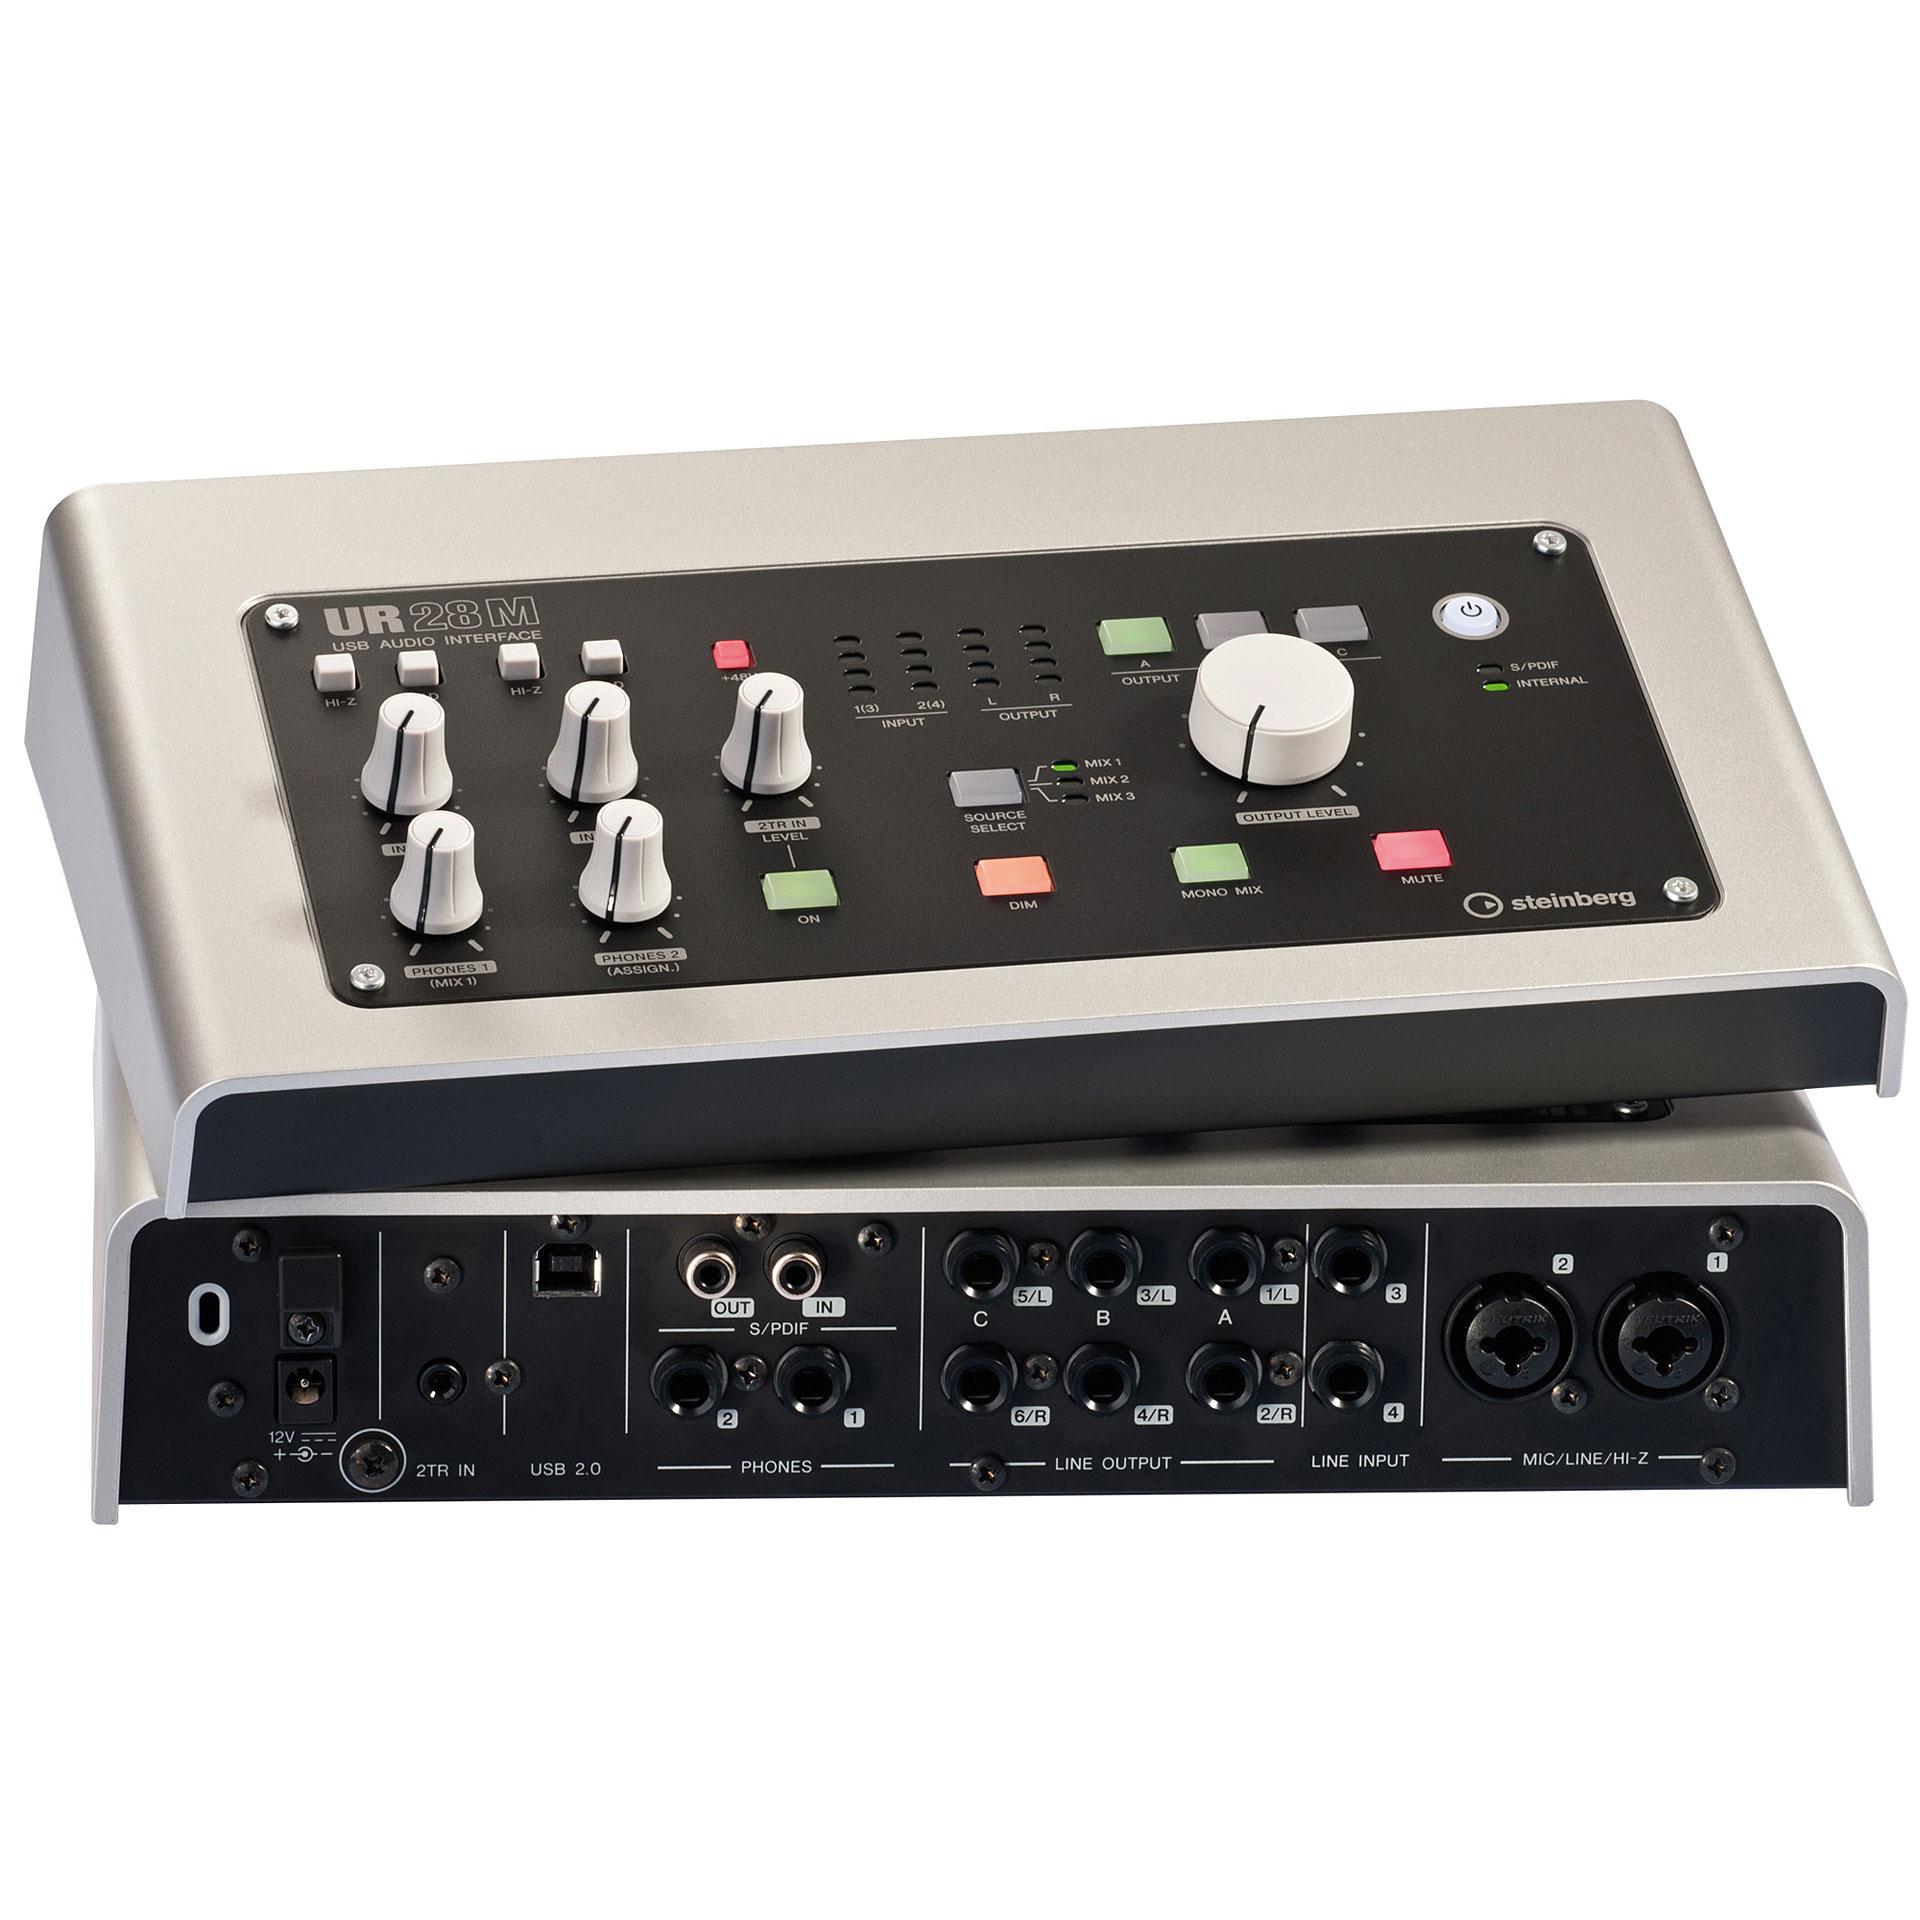 steinberg ur28m audio interface. Black Bedroom Furniture Sets. Home Design Ideas